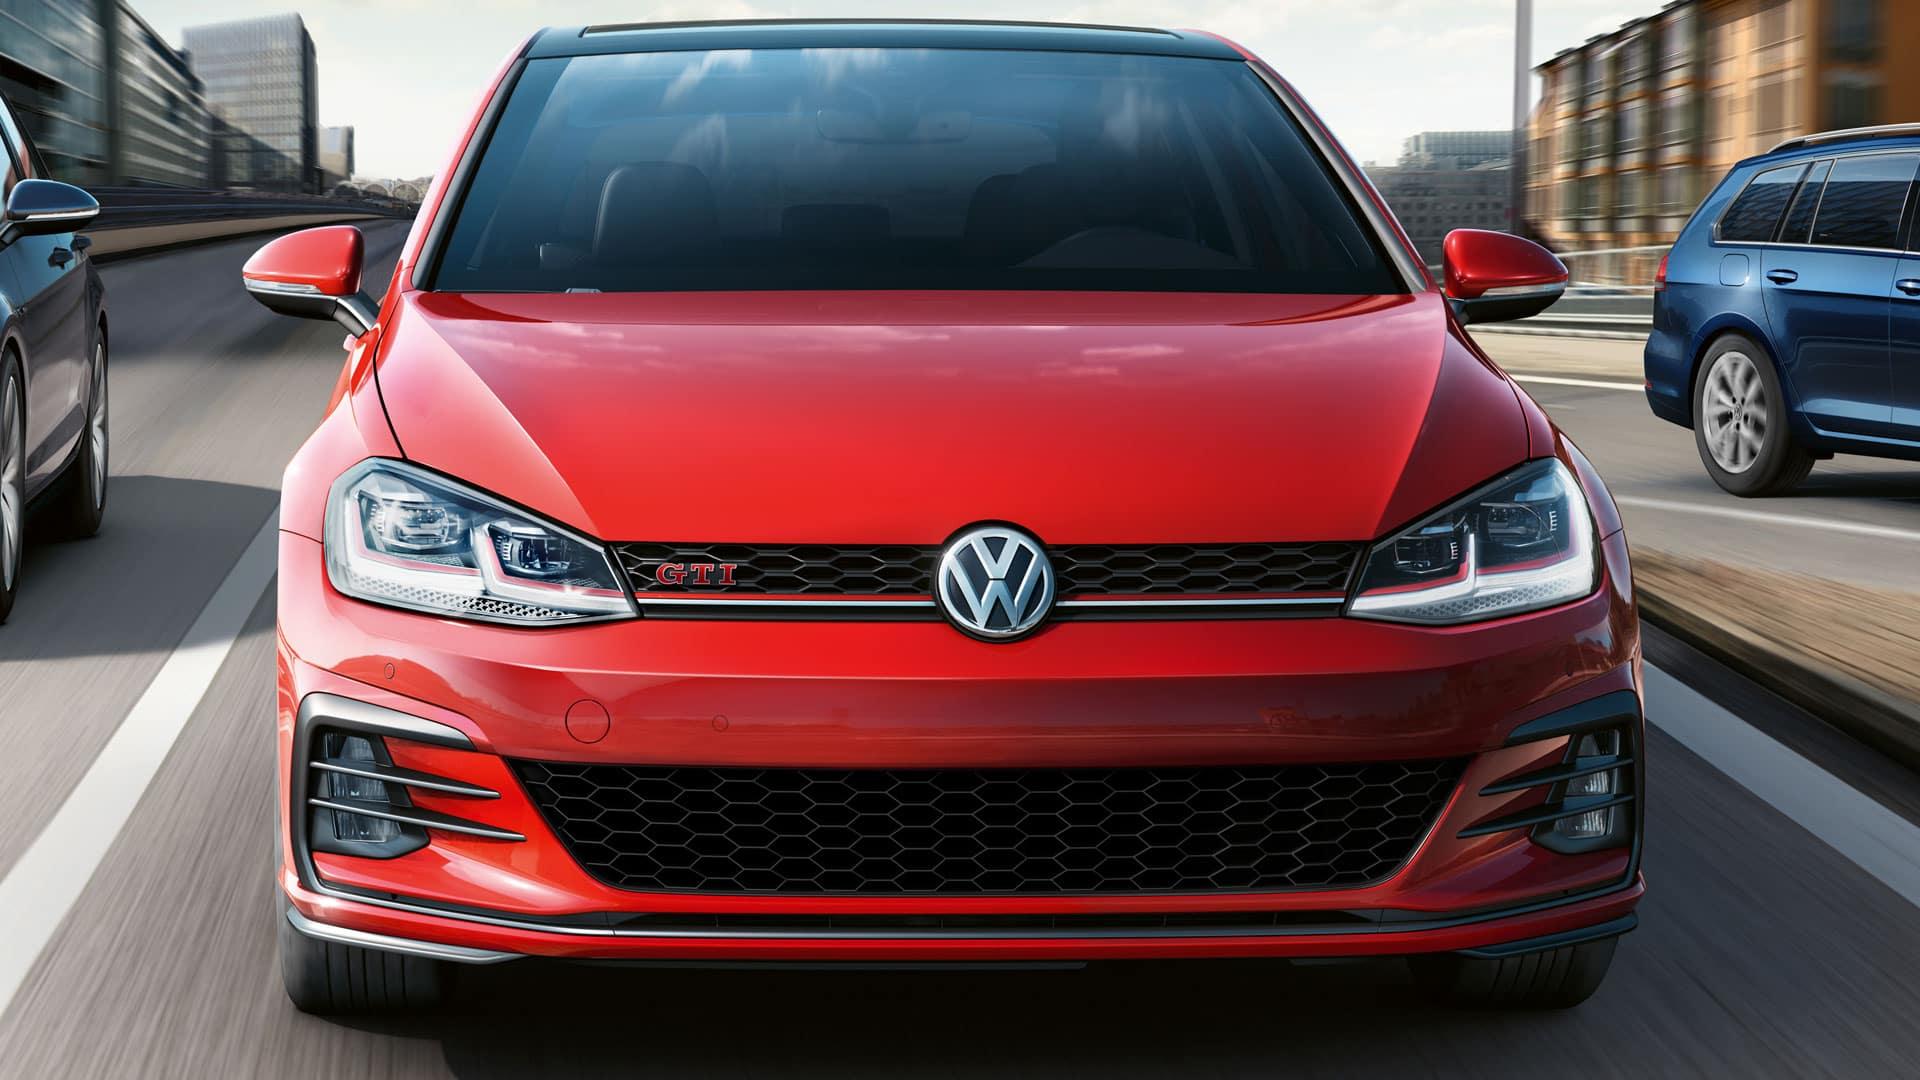 2019 VW Golf GTI exterior